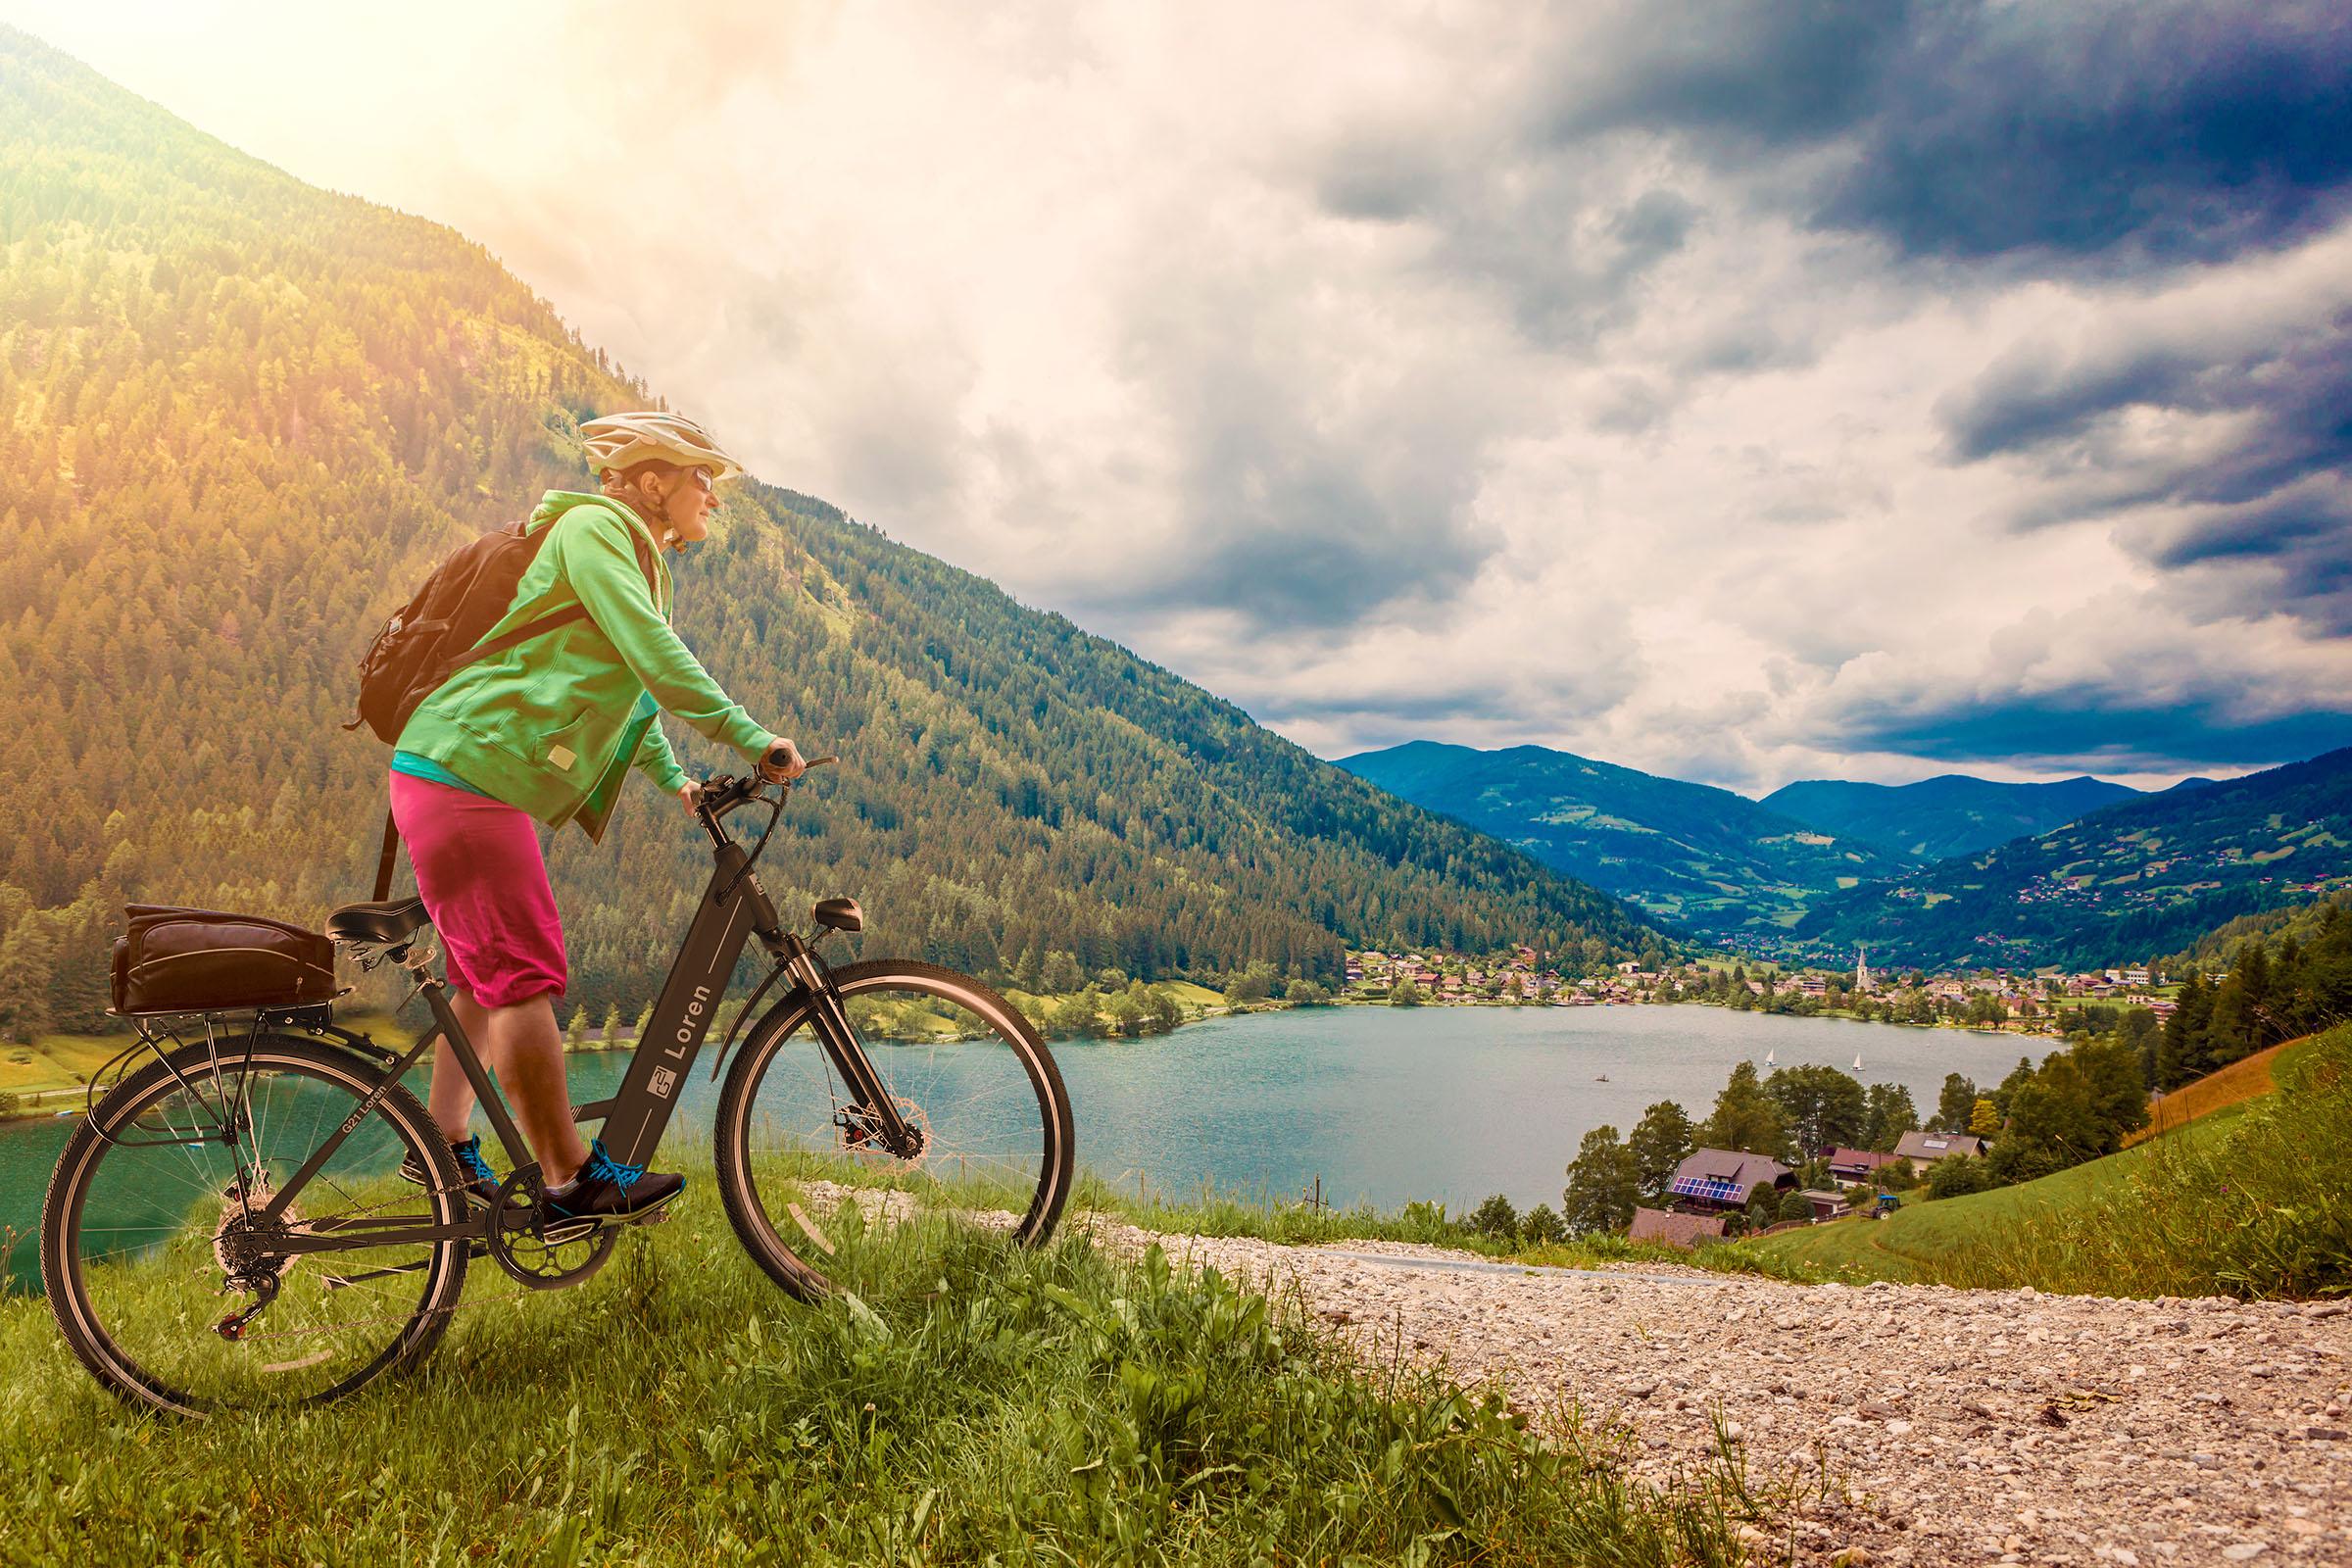 Mestské elektrokolo G21 Loren záber na krajinu a muža na bicykli